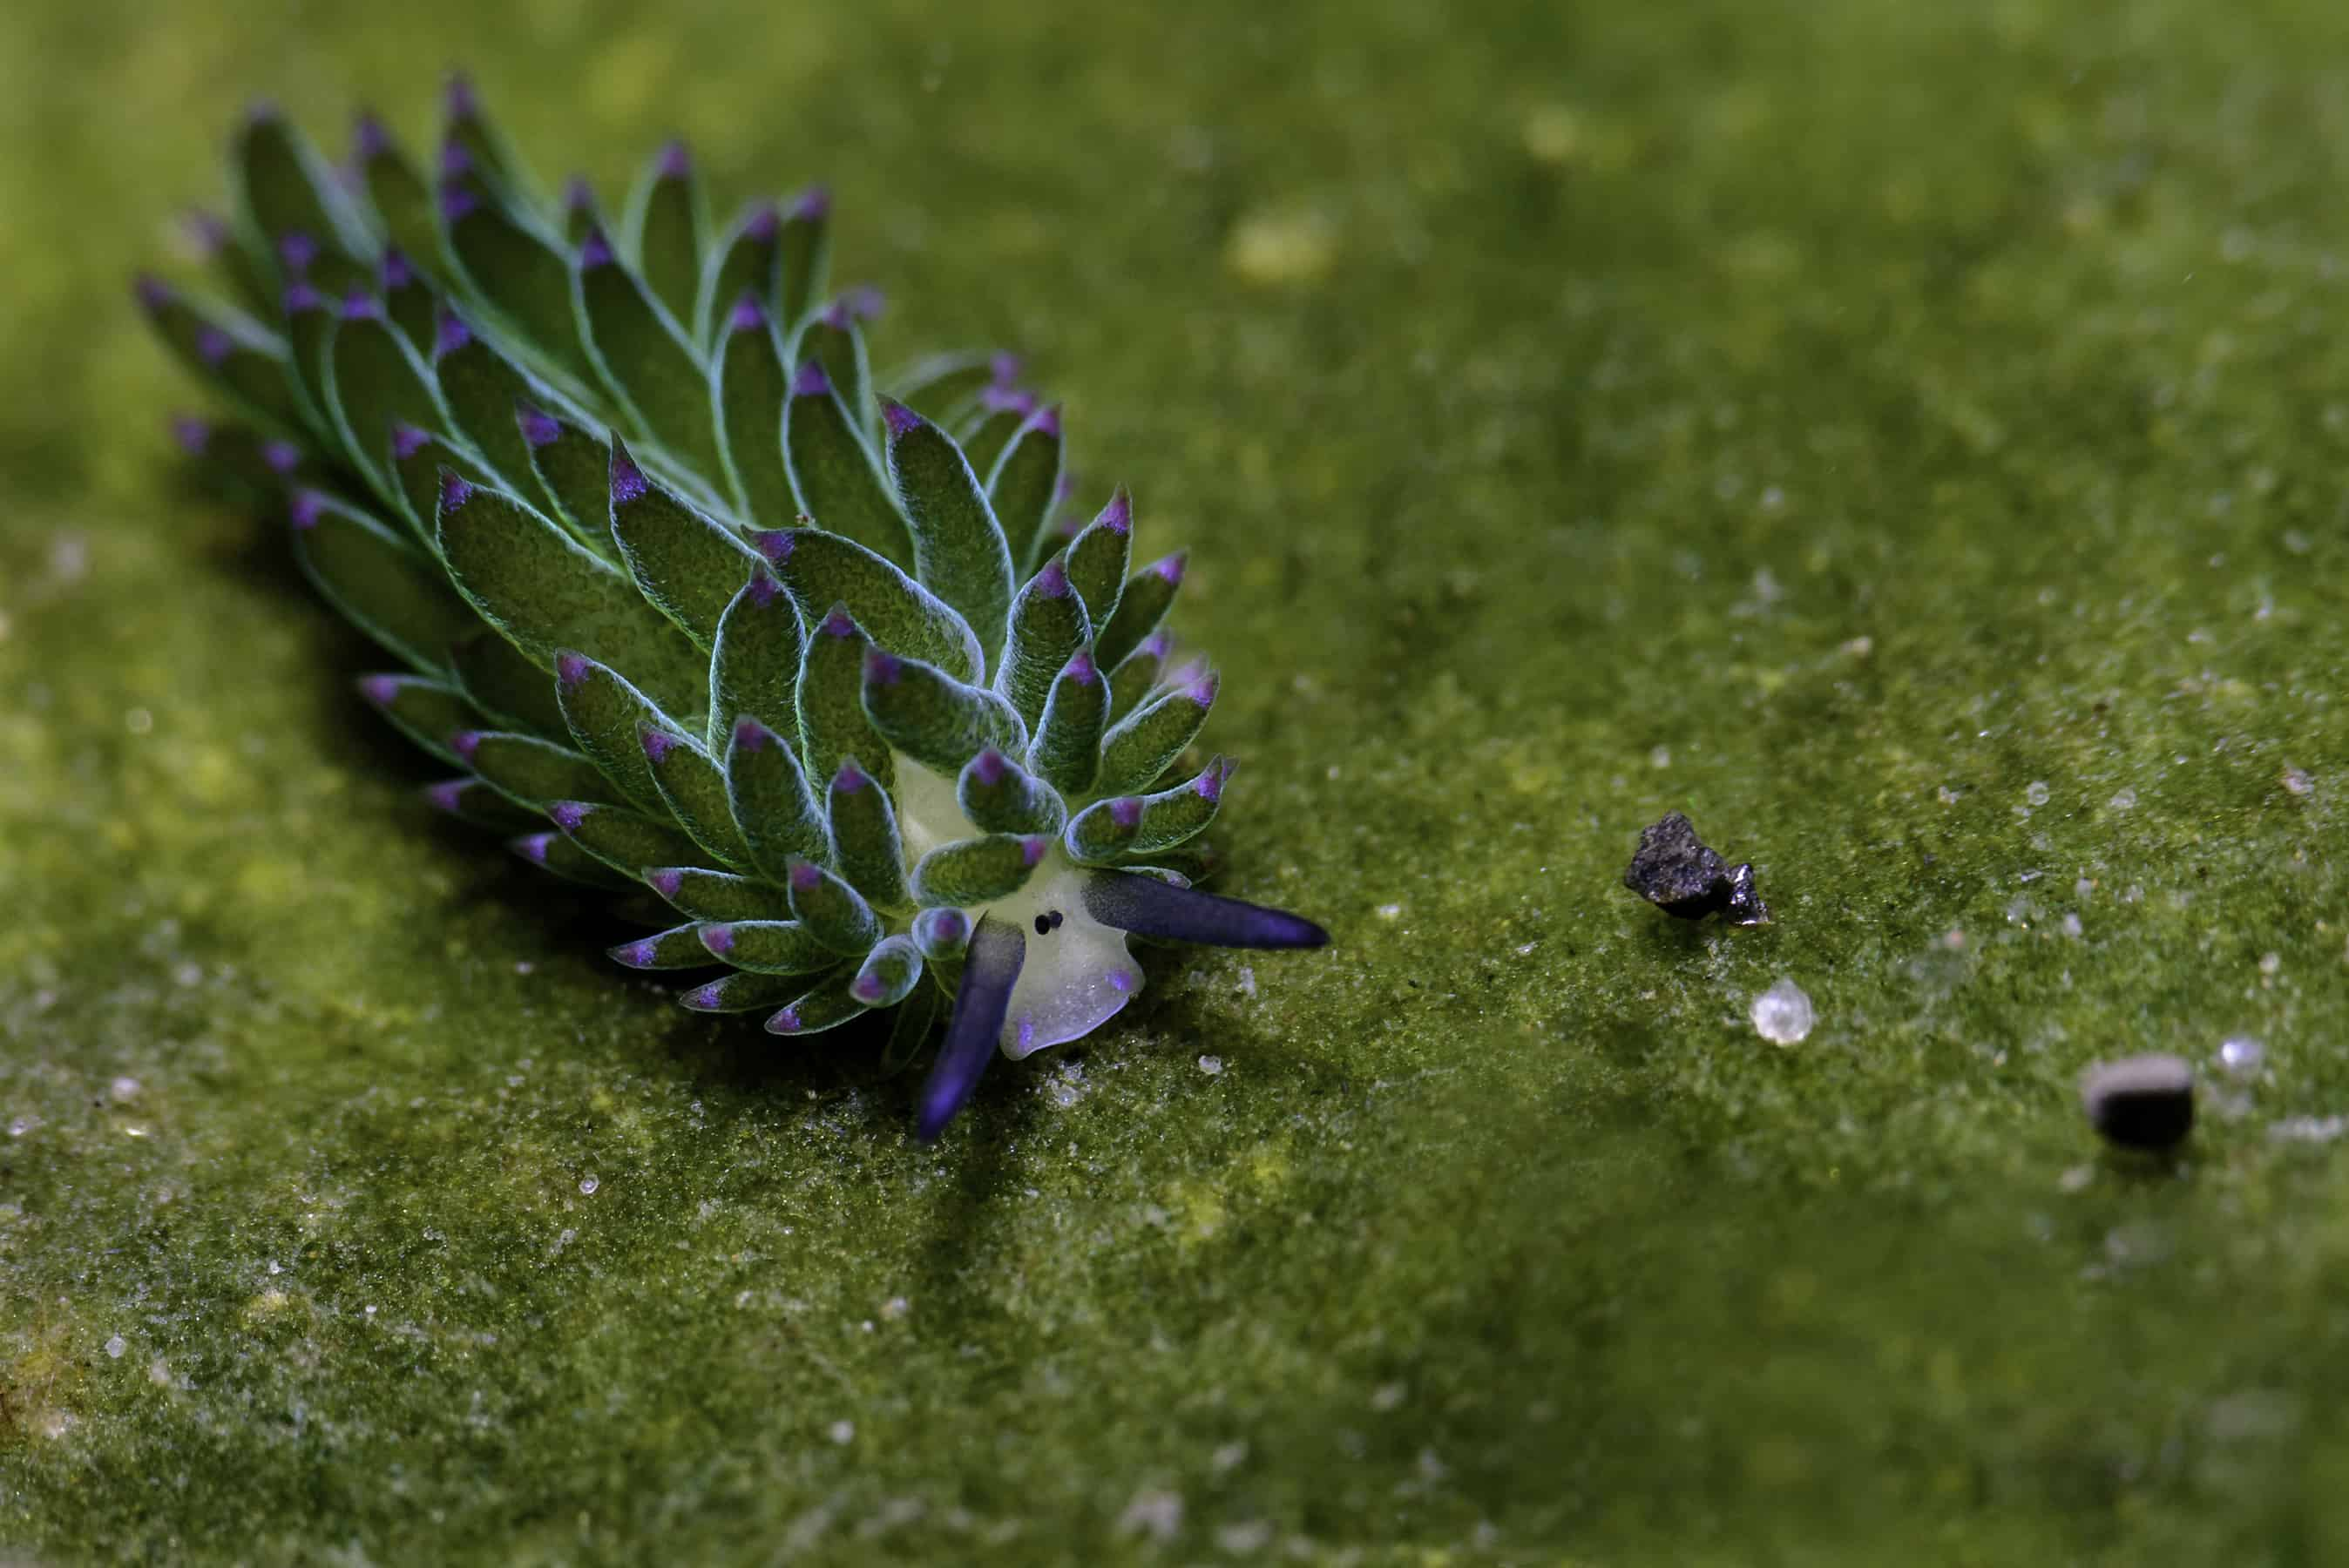 Sapsucking slug